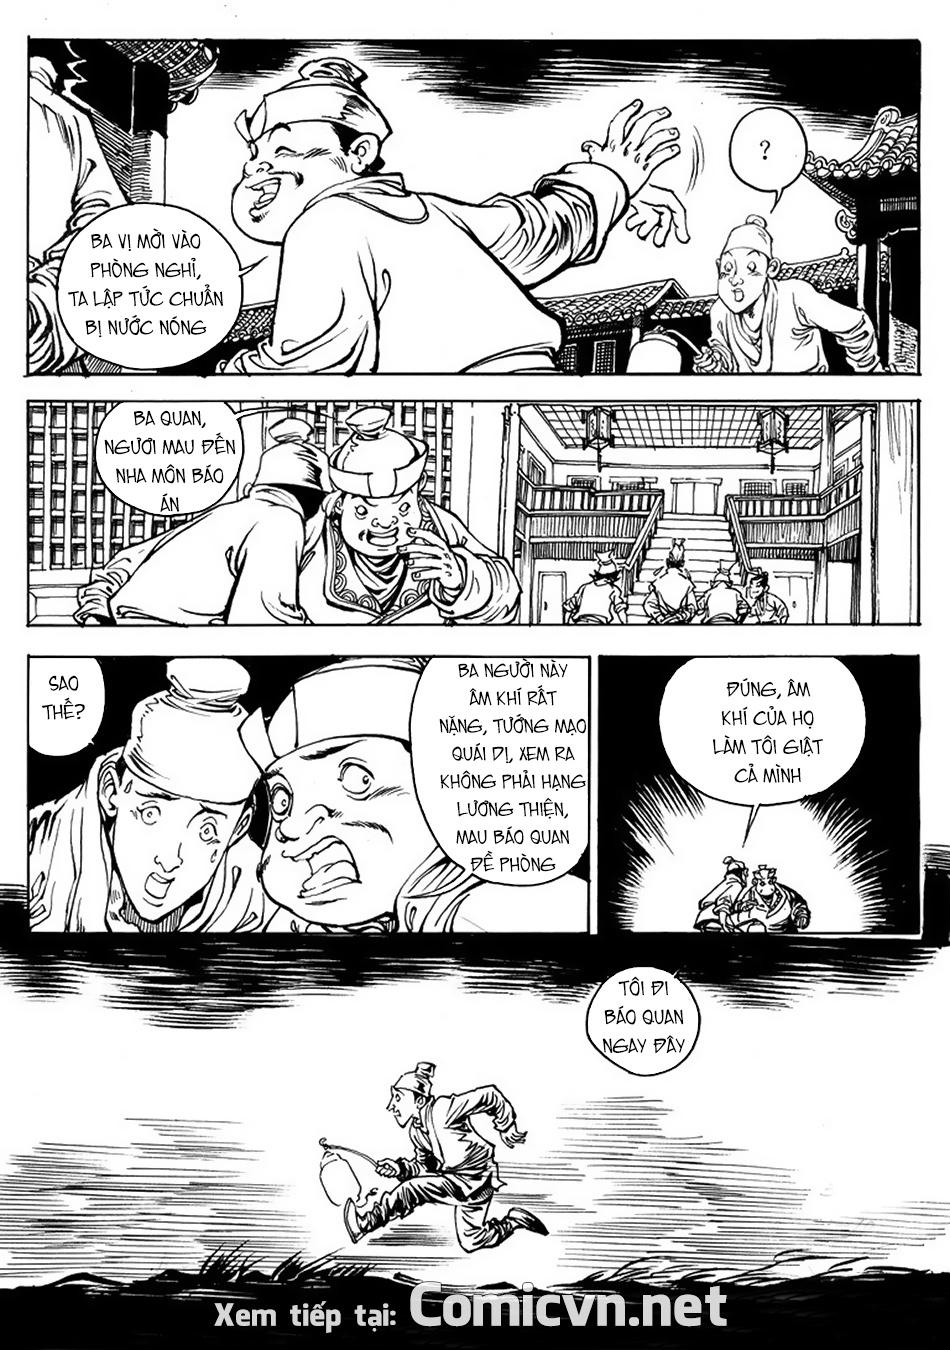 Chung Quỳ Truyền Kỳ Chapter 17 - Hamtruyen.vn